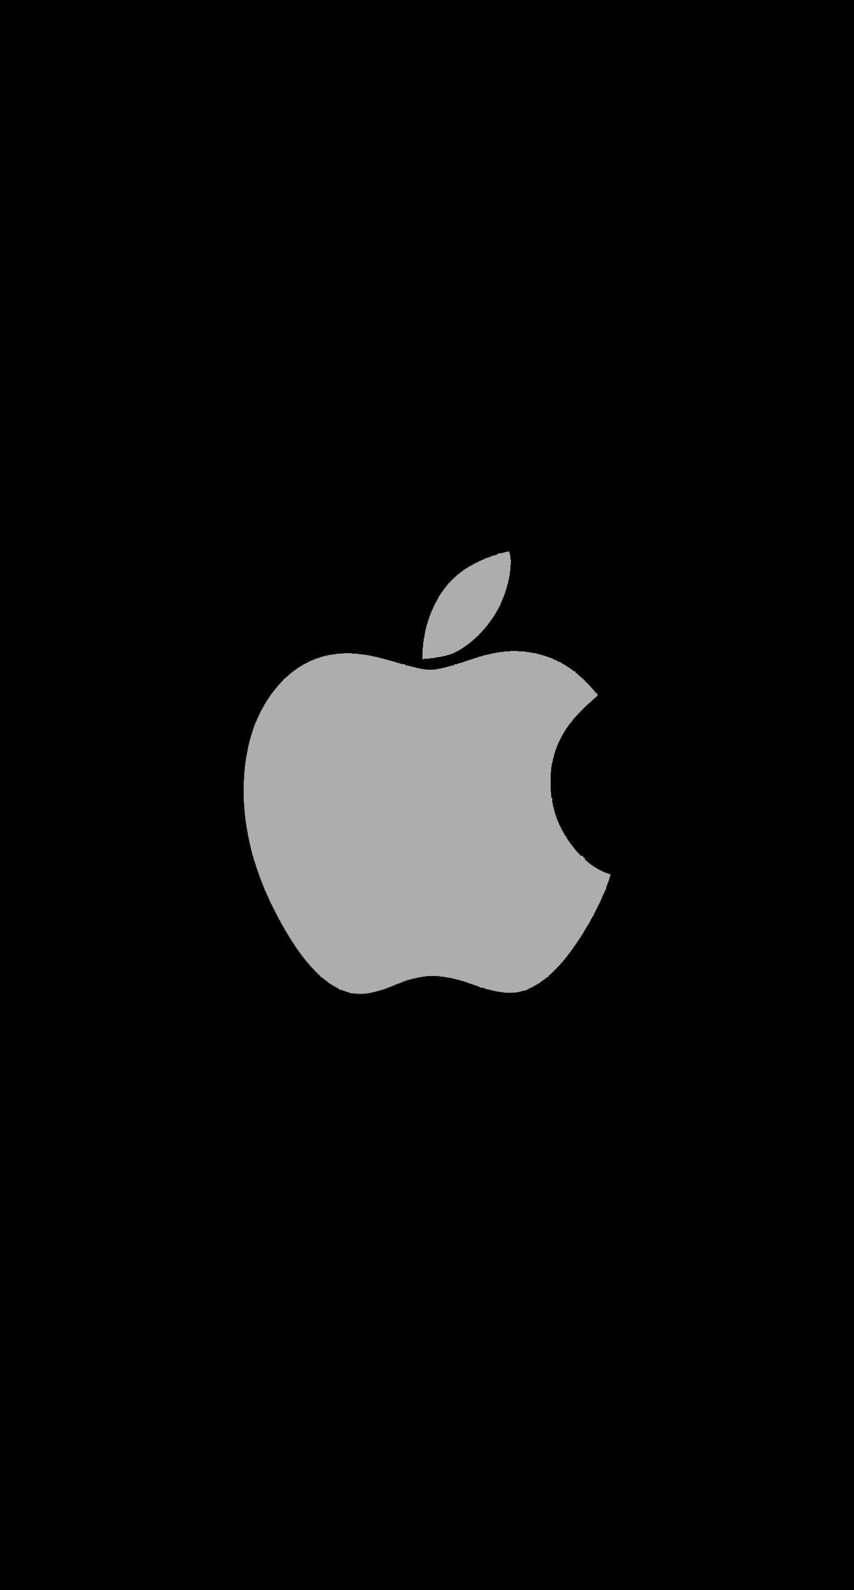 apple iphone 7 wallpaper. iphone 7 wallpaper apple iphone